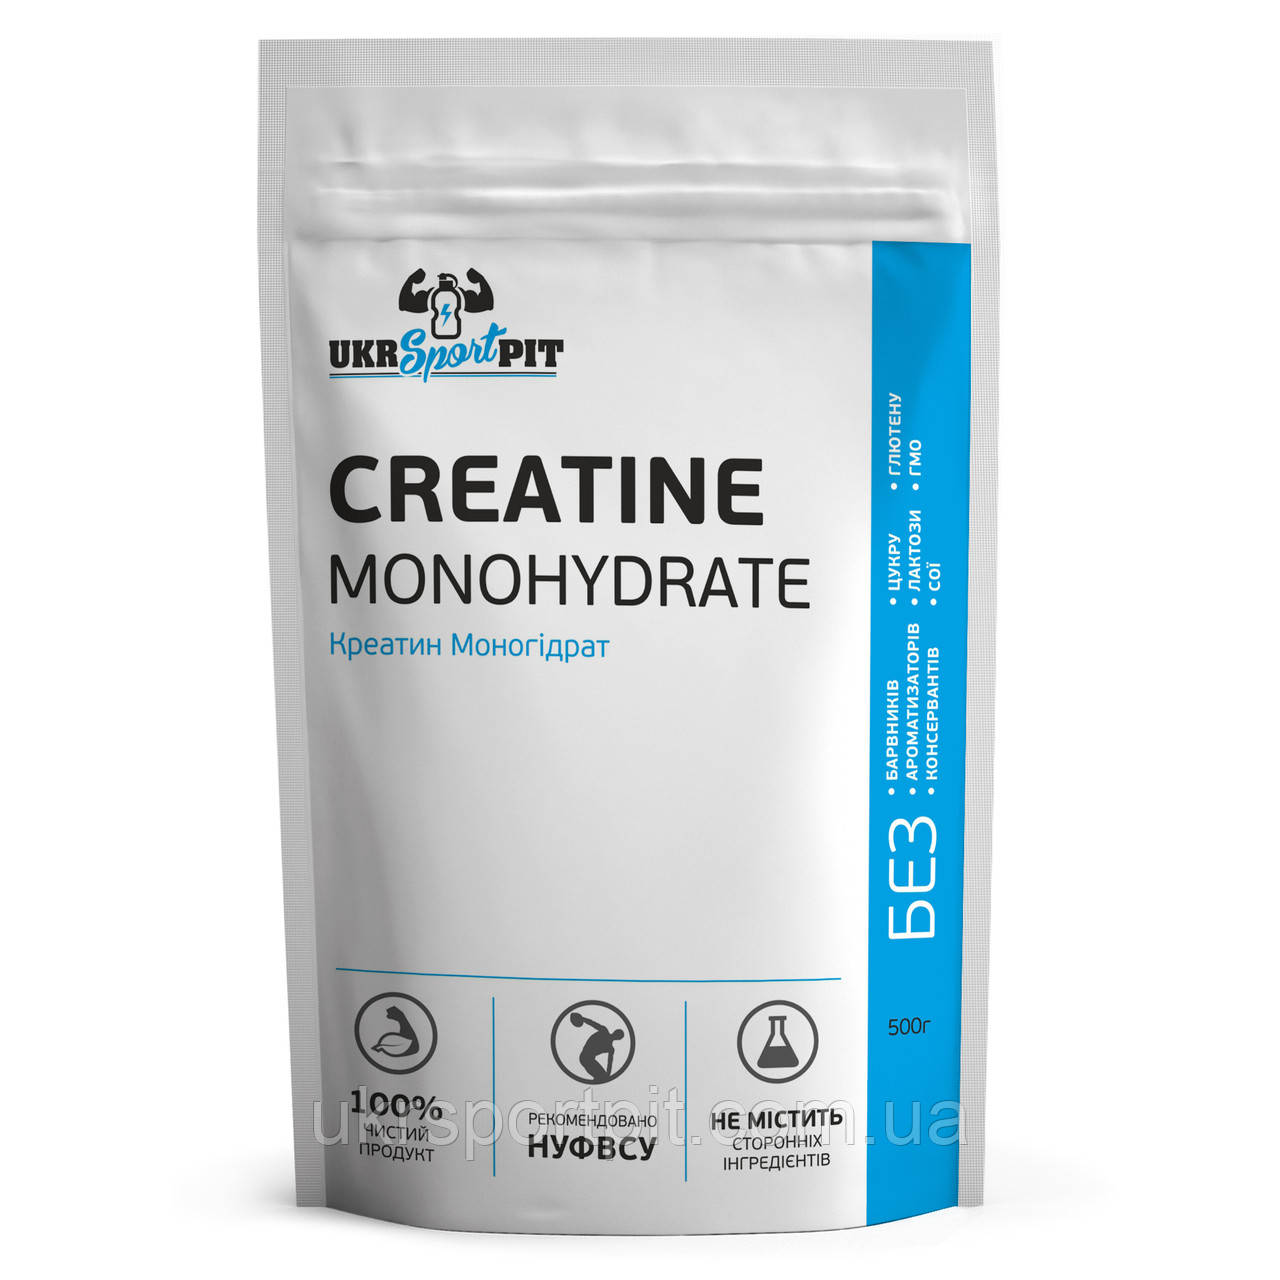 Креатин Моногидрат (Creatine Monohydrate) 500г